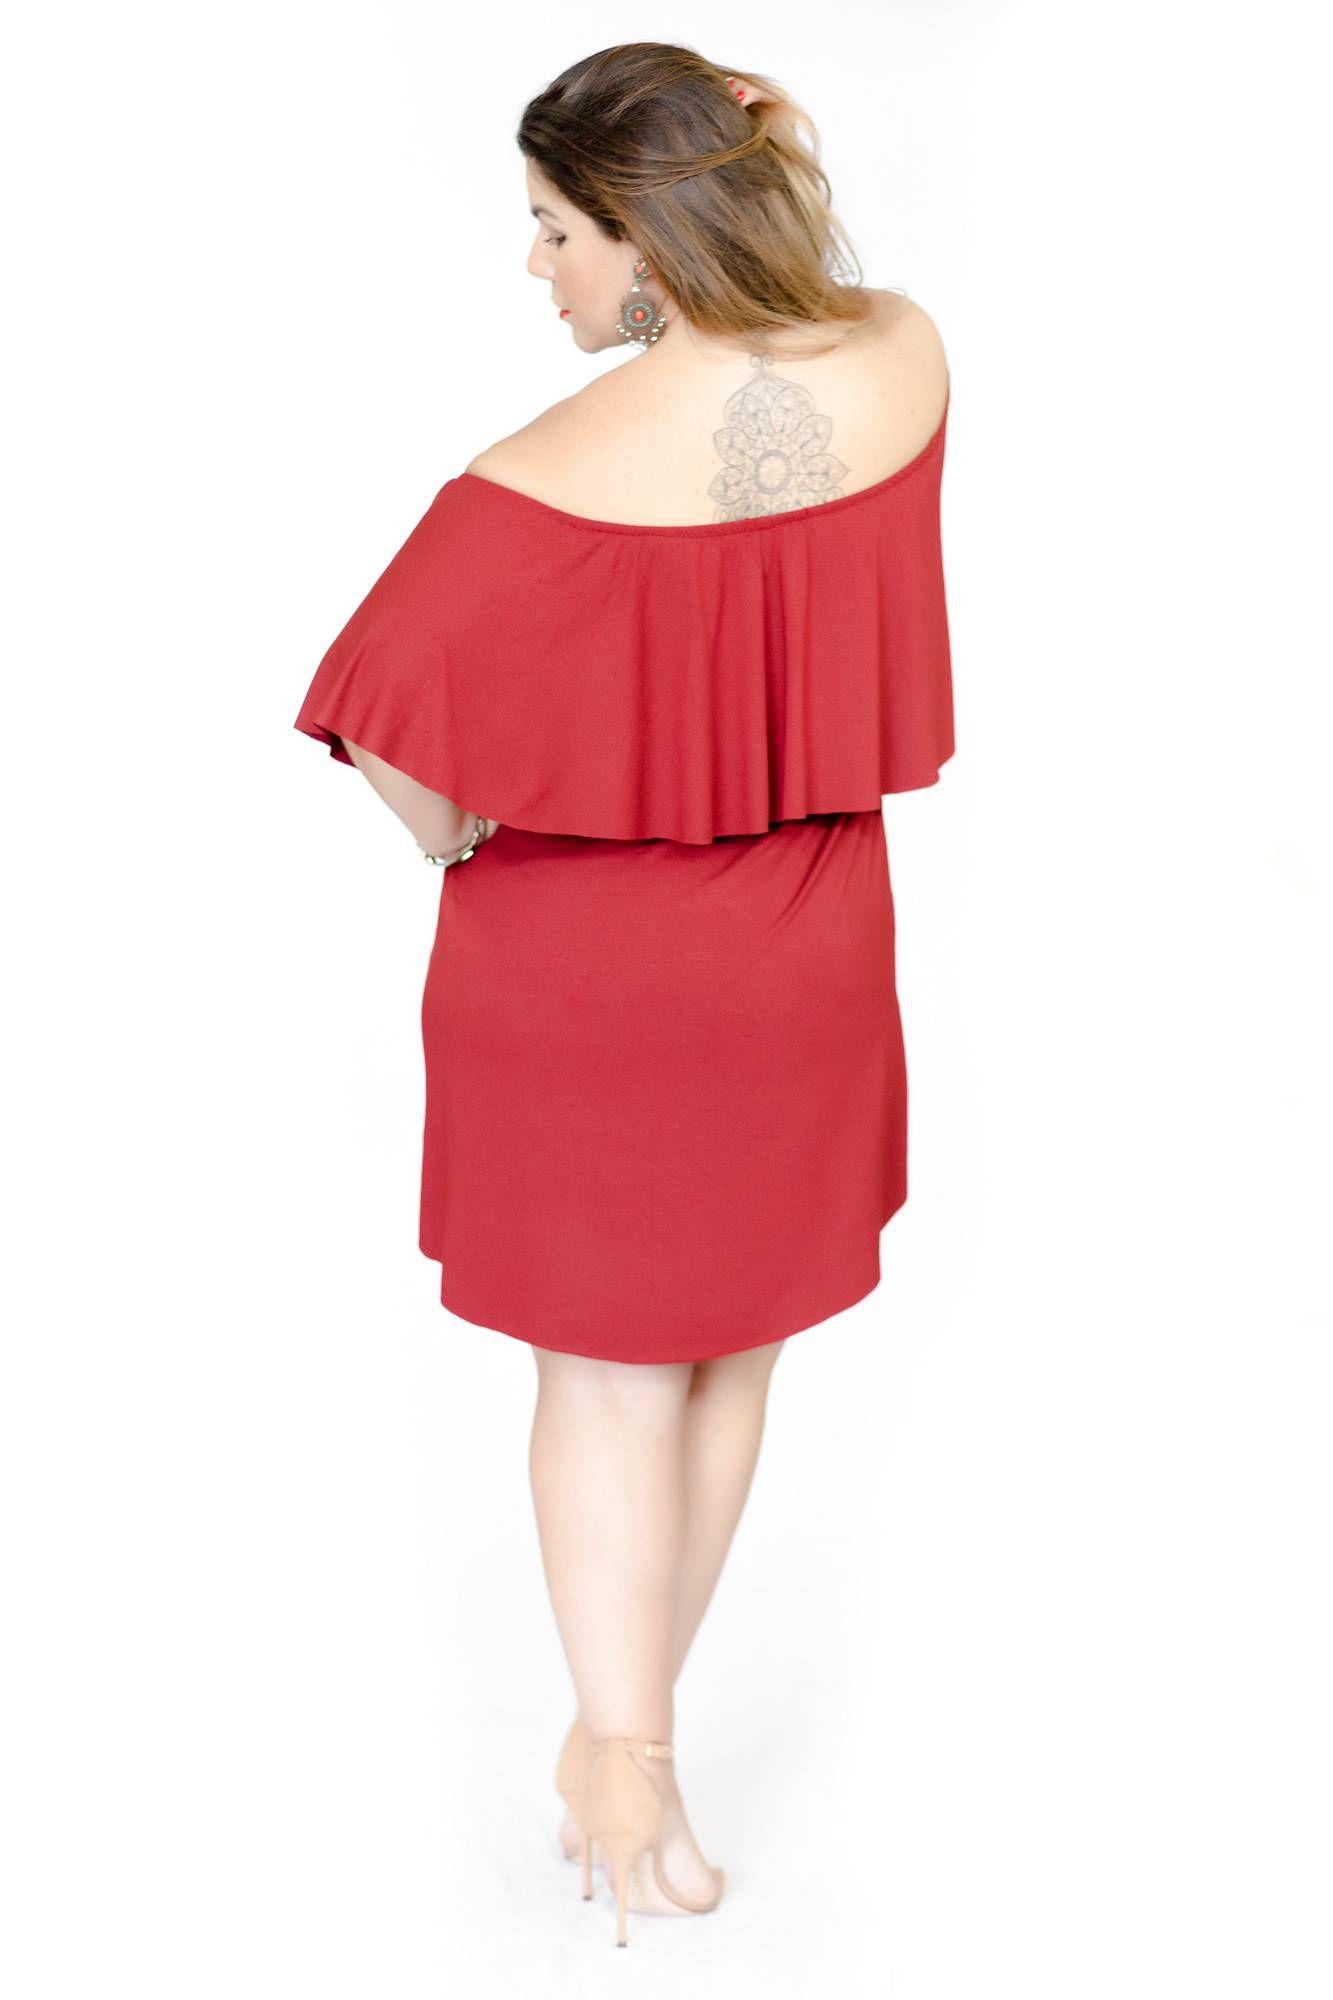 Vestido curto ombro a ombro vermelho PLUS SIZE